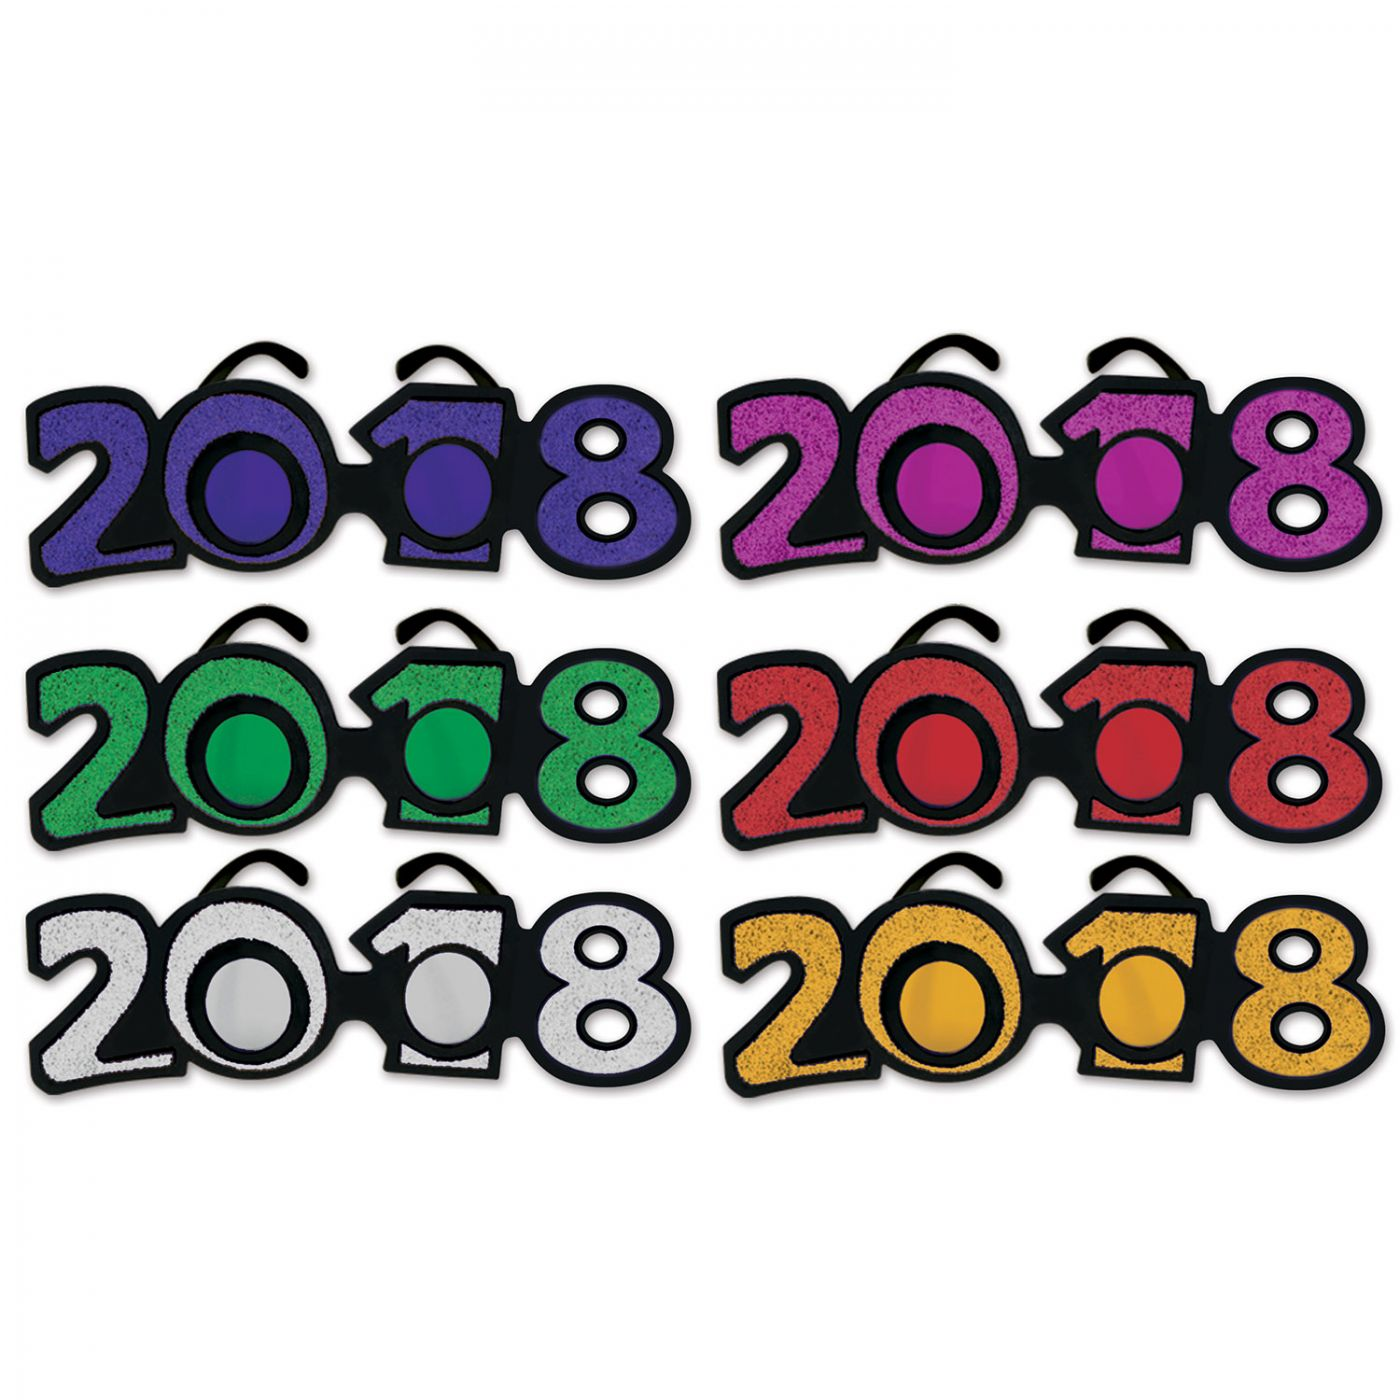 2018  Glittered Plastic Eyeglasses image